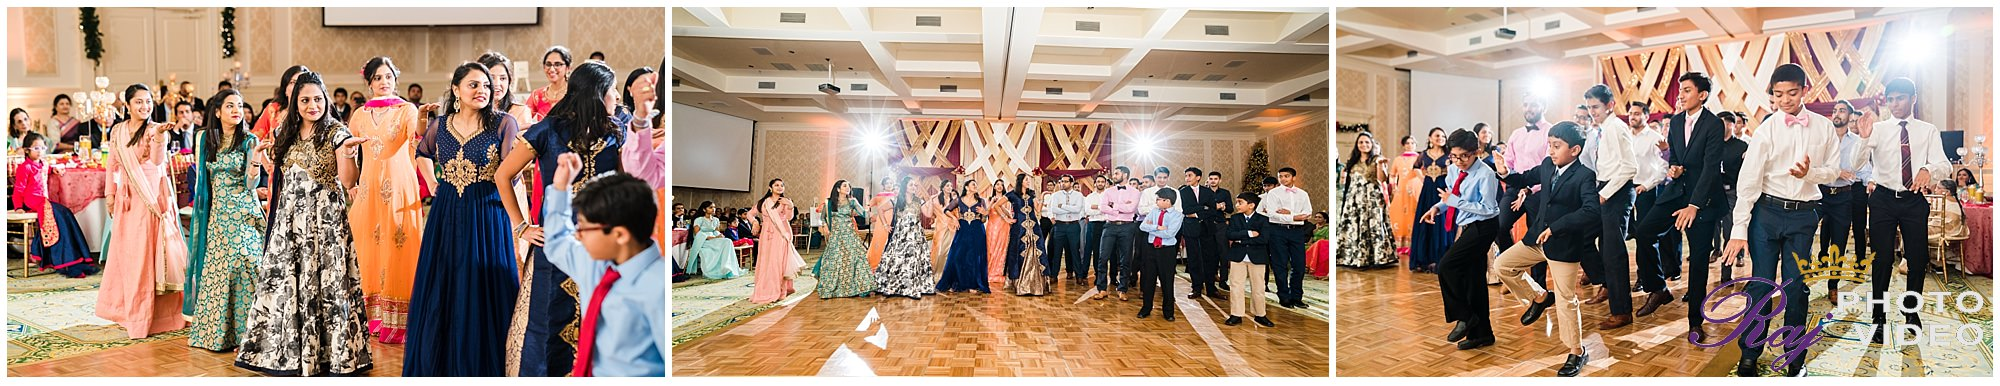 Founders-Inn-and-Spa-Virginia-Beach-VA-Indian-Wedding-Harini-Vivek-84.jpg